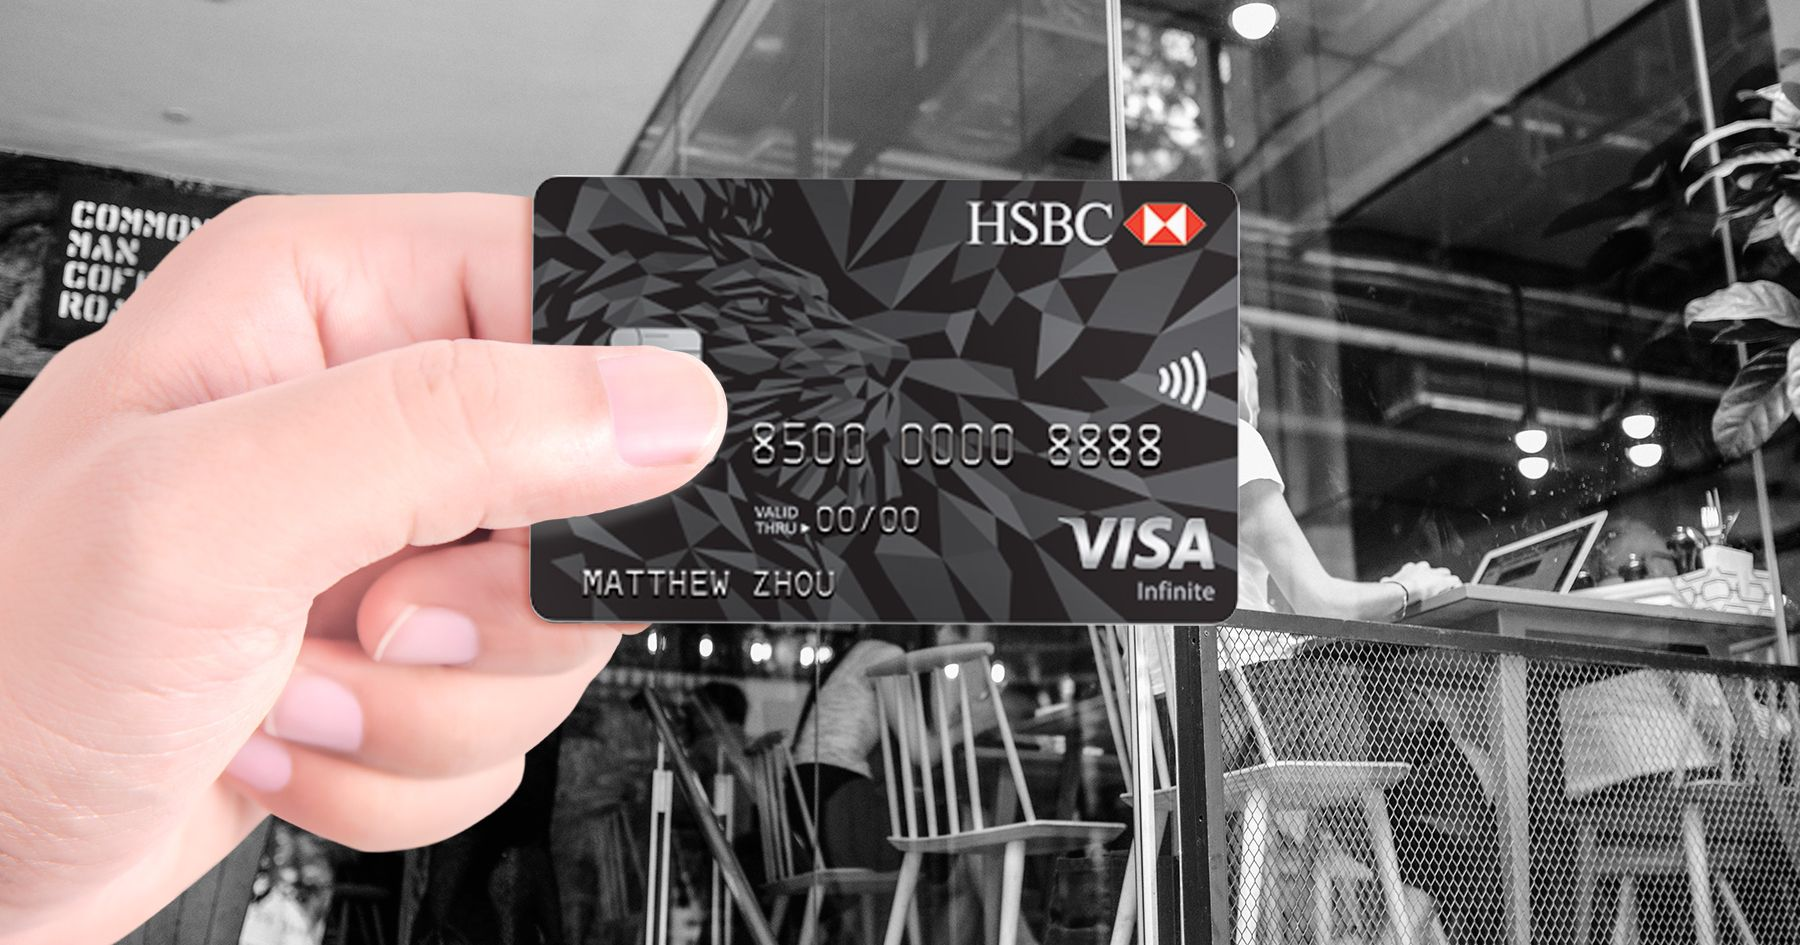 Top 5 Reasons To Apply For Hsbc Visa Infinite Creditcardapplication Creditcardoffer Creditcardreview Hsbc Travel Rewards Credit Cards Rewards Credit Cards